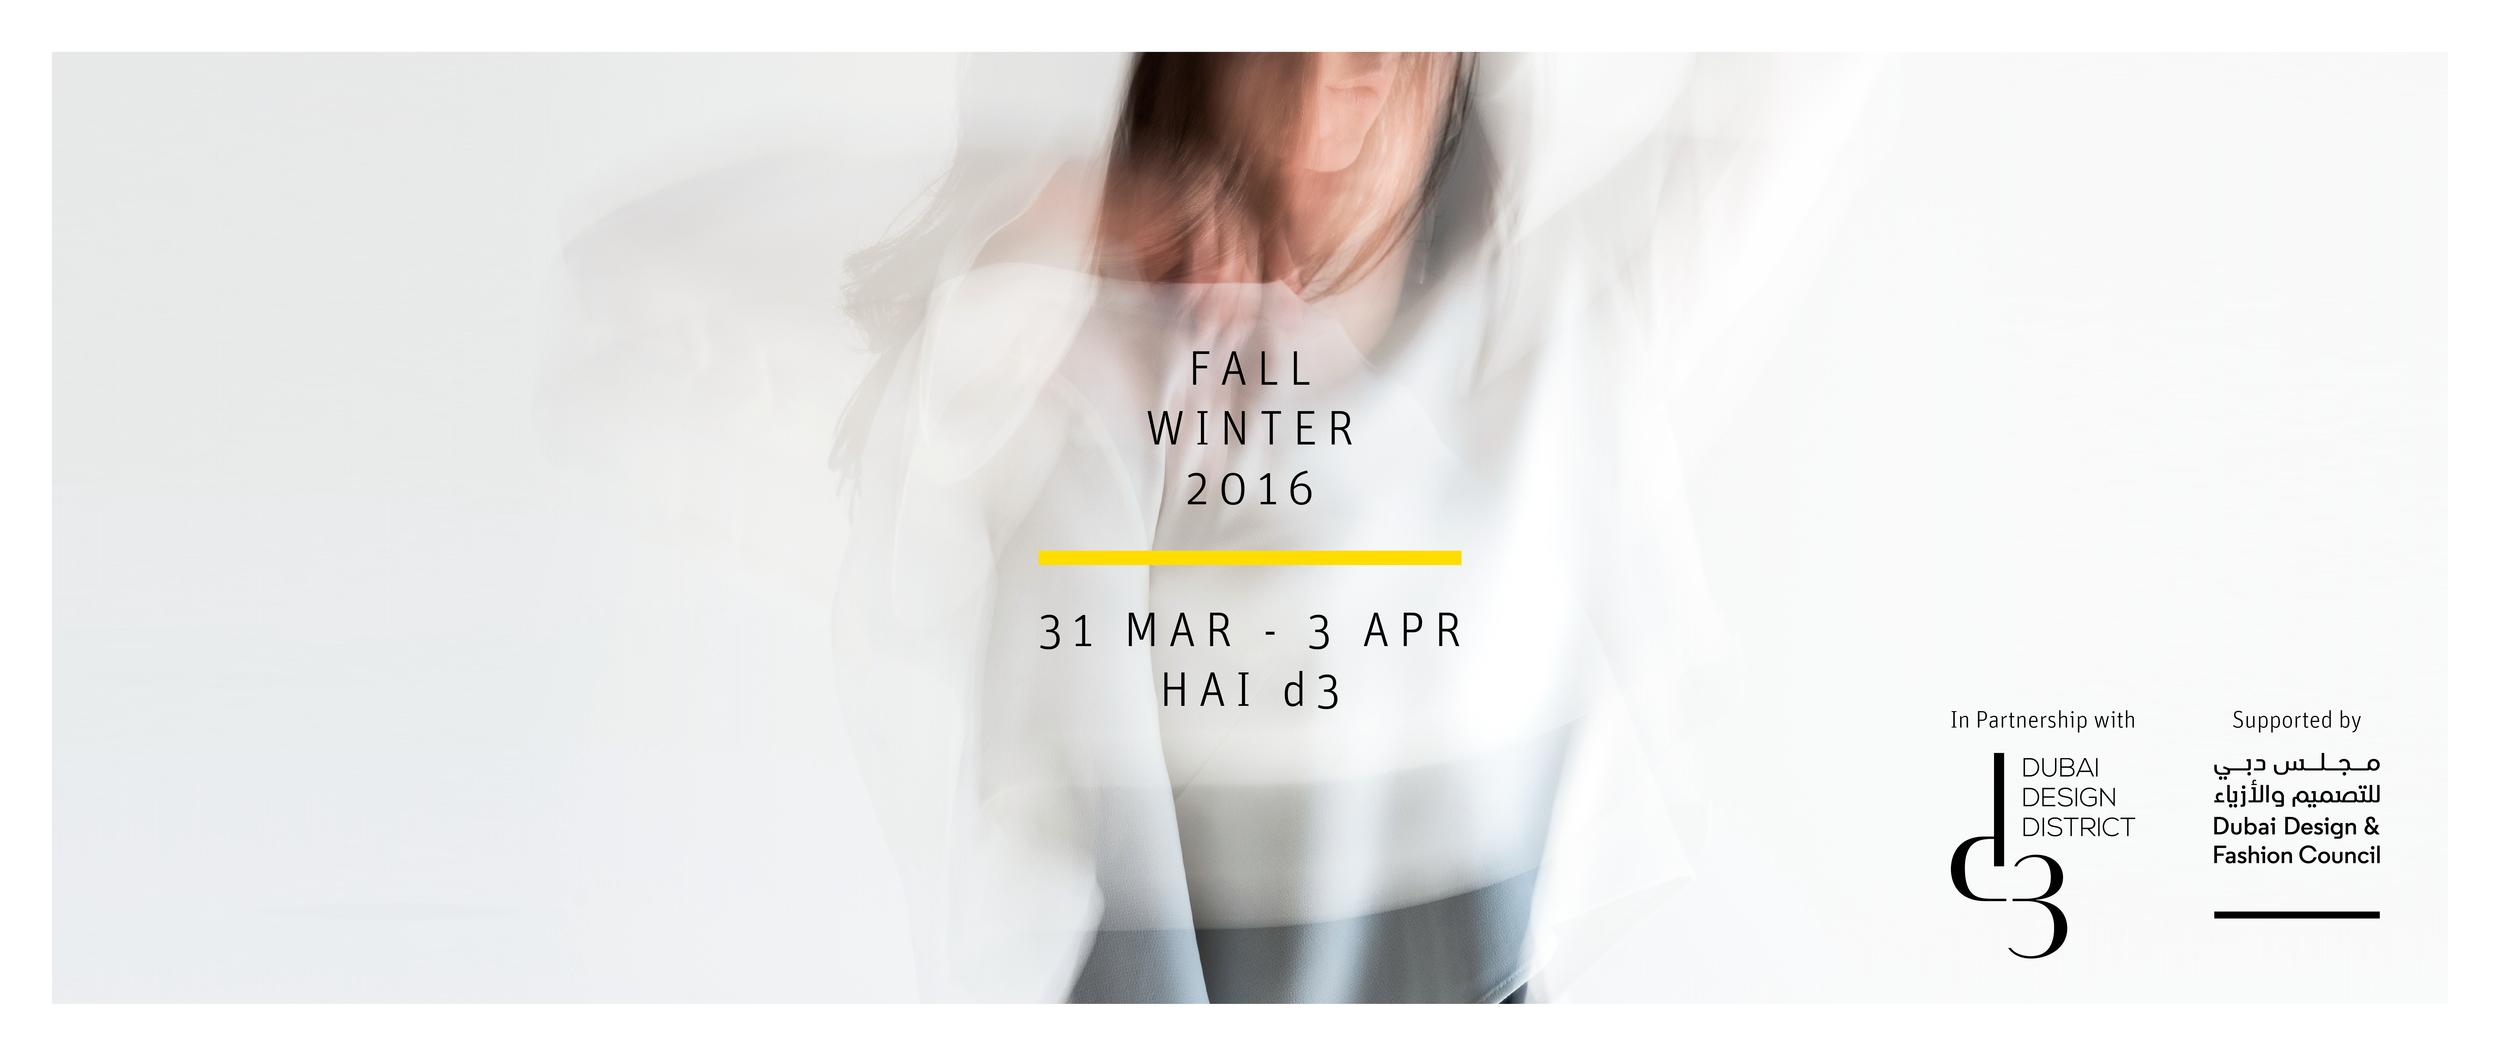 Ffwd Earns Endorsement By Dubai Design And Fashion Council And Moves Seventh Edition To Dubai Design District Fashion Forward Dubai